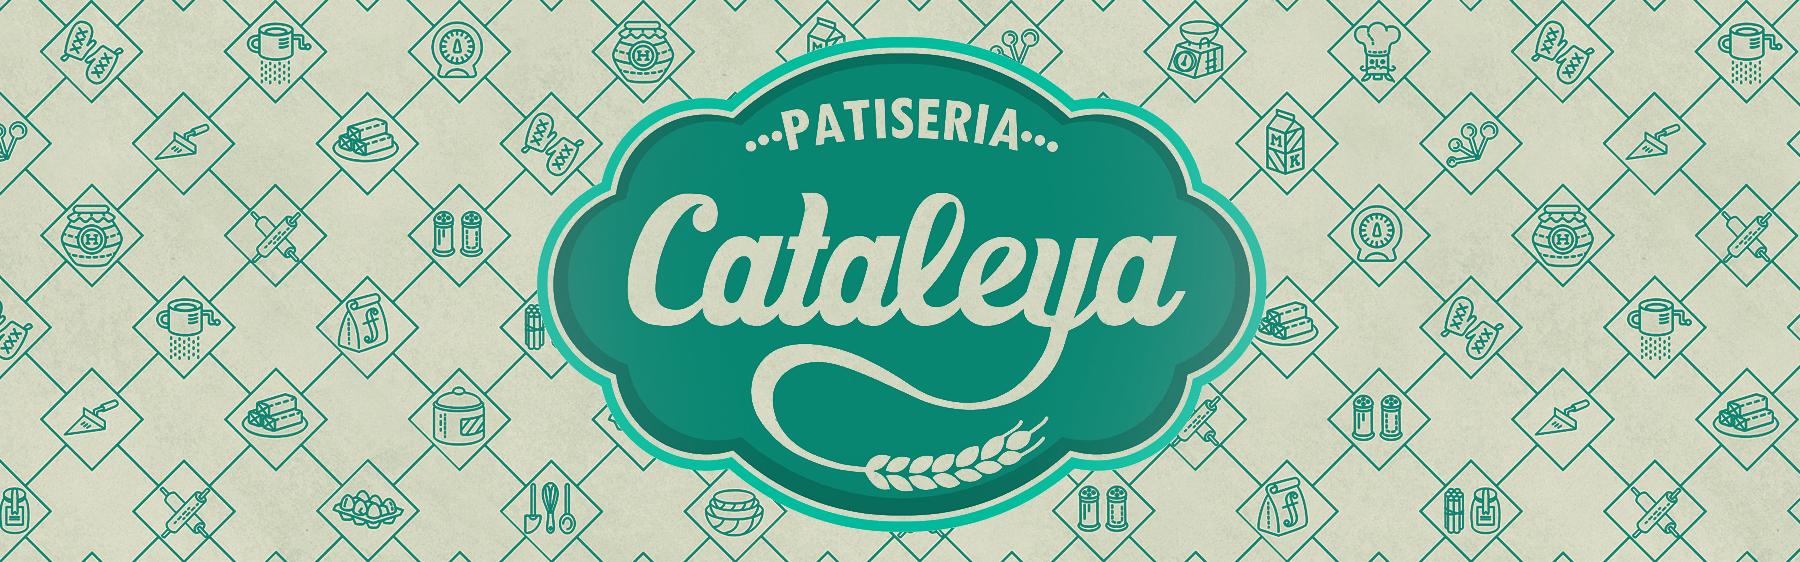 Yo te lo dije, Cataleya